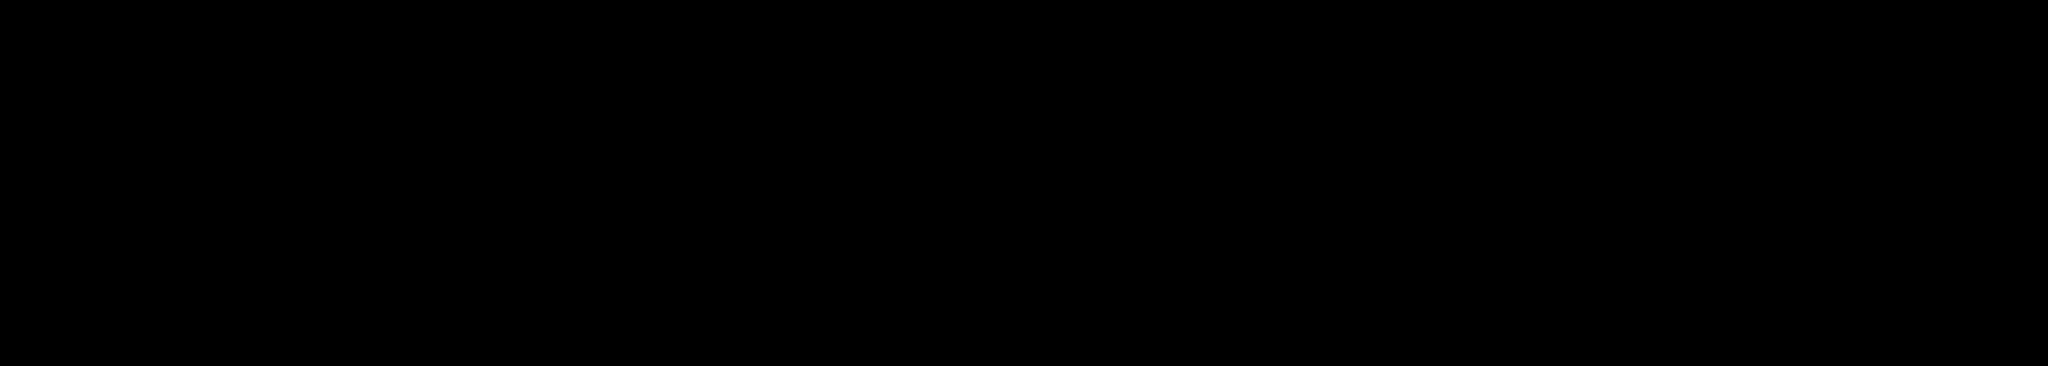 StSebald-04